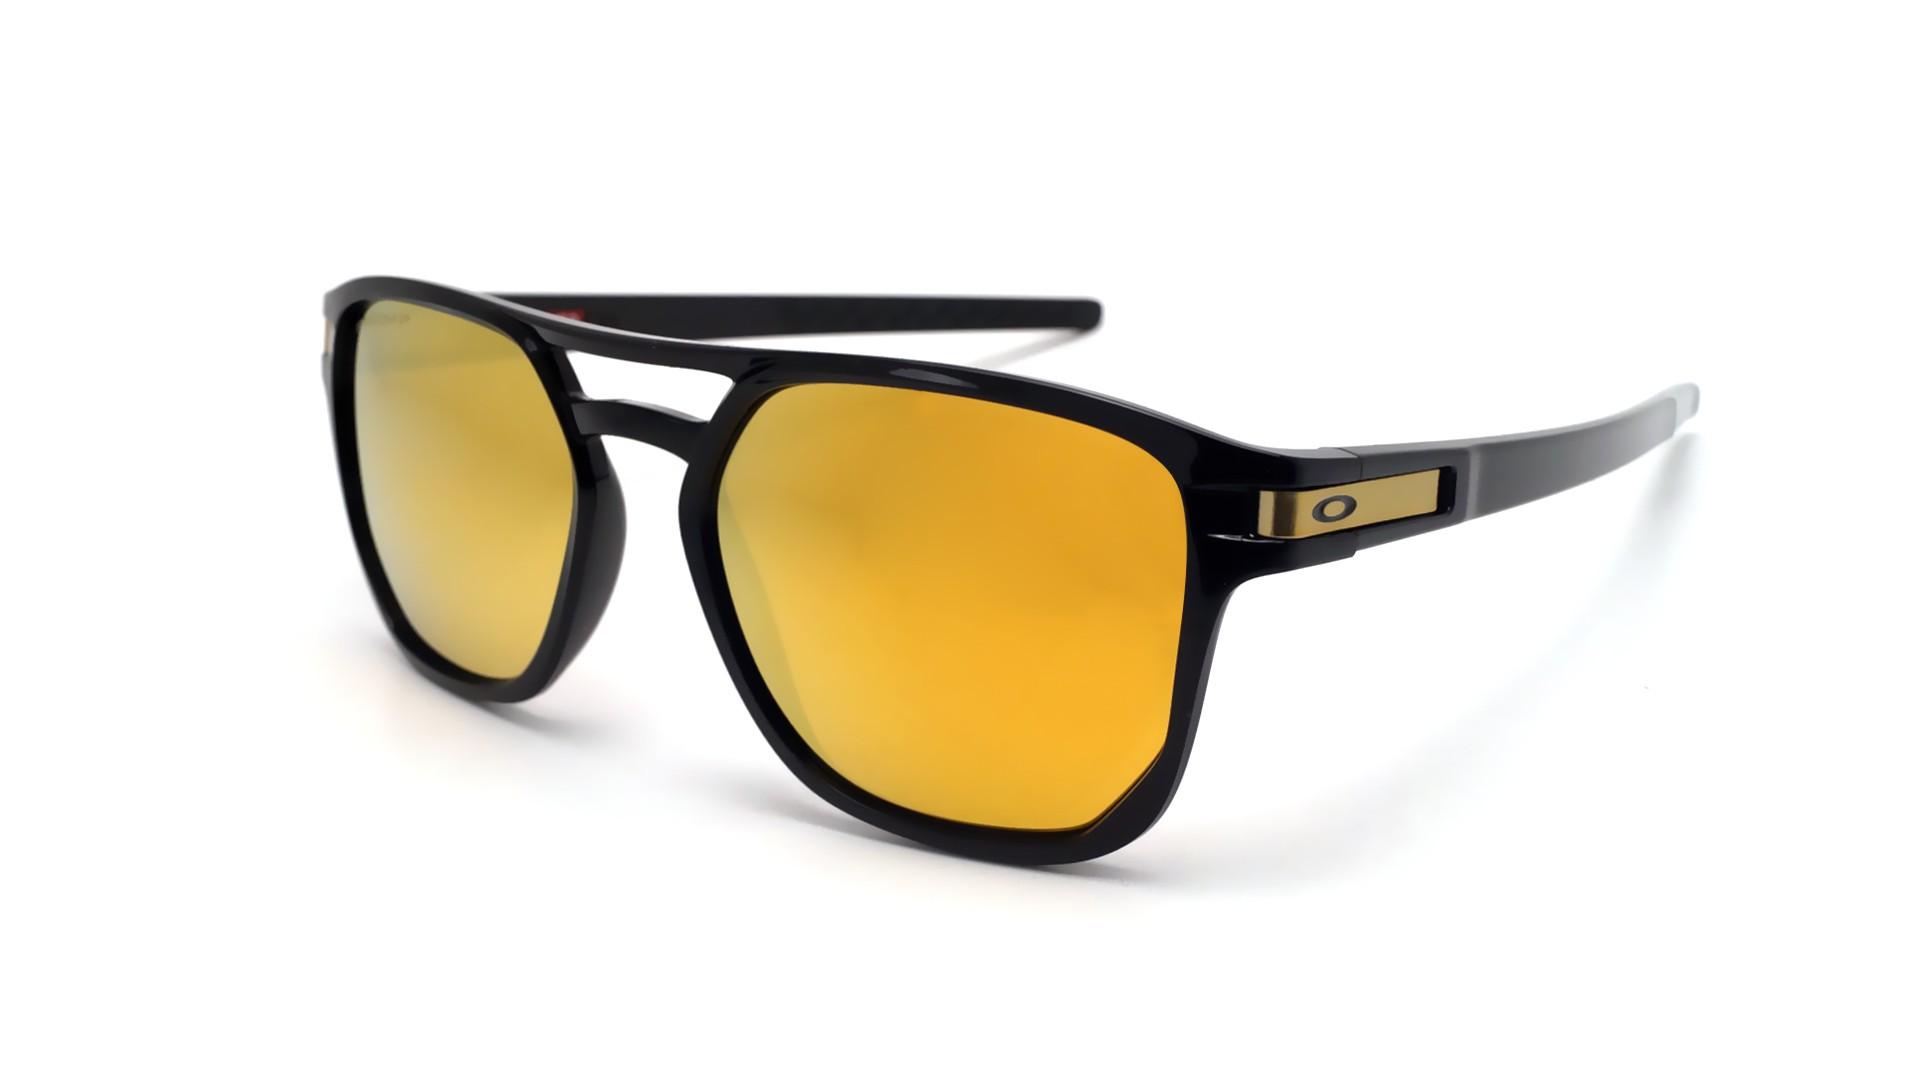 2a881e36f0 Sunglasses Oakley Latch Beta Black Prizm OO9436 04 54-18 Medium Polarized  Flash